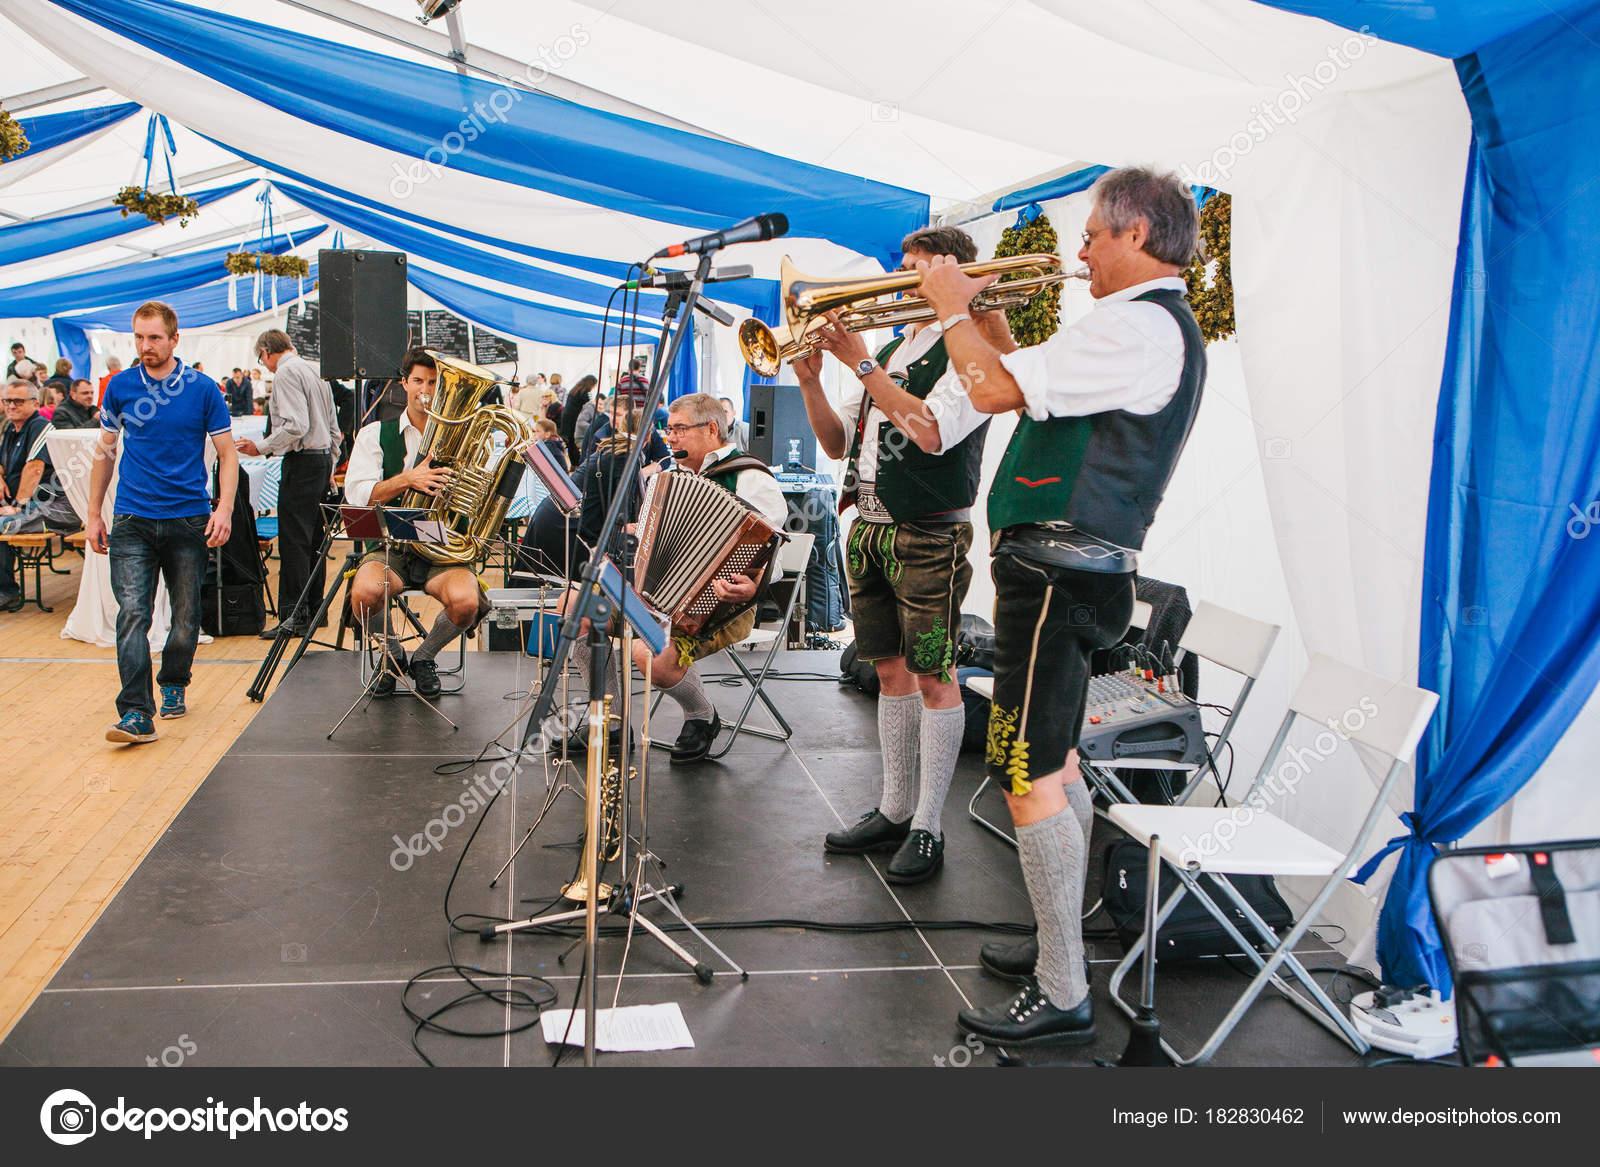 Prague, September 23, 2017: Celebrating the traditional German beer